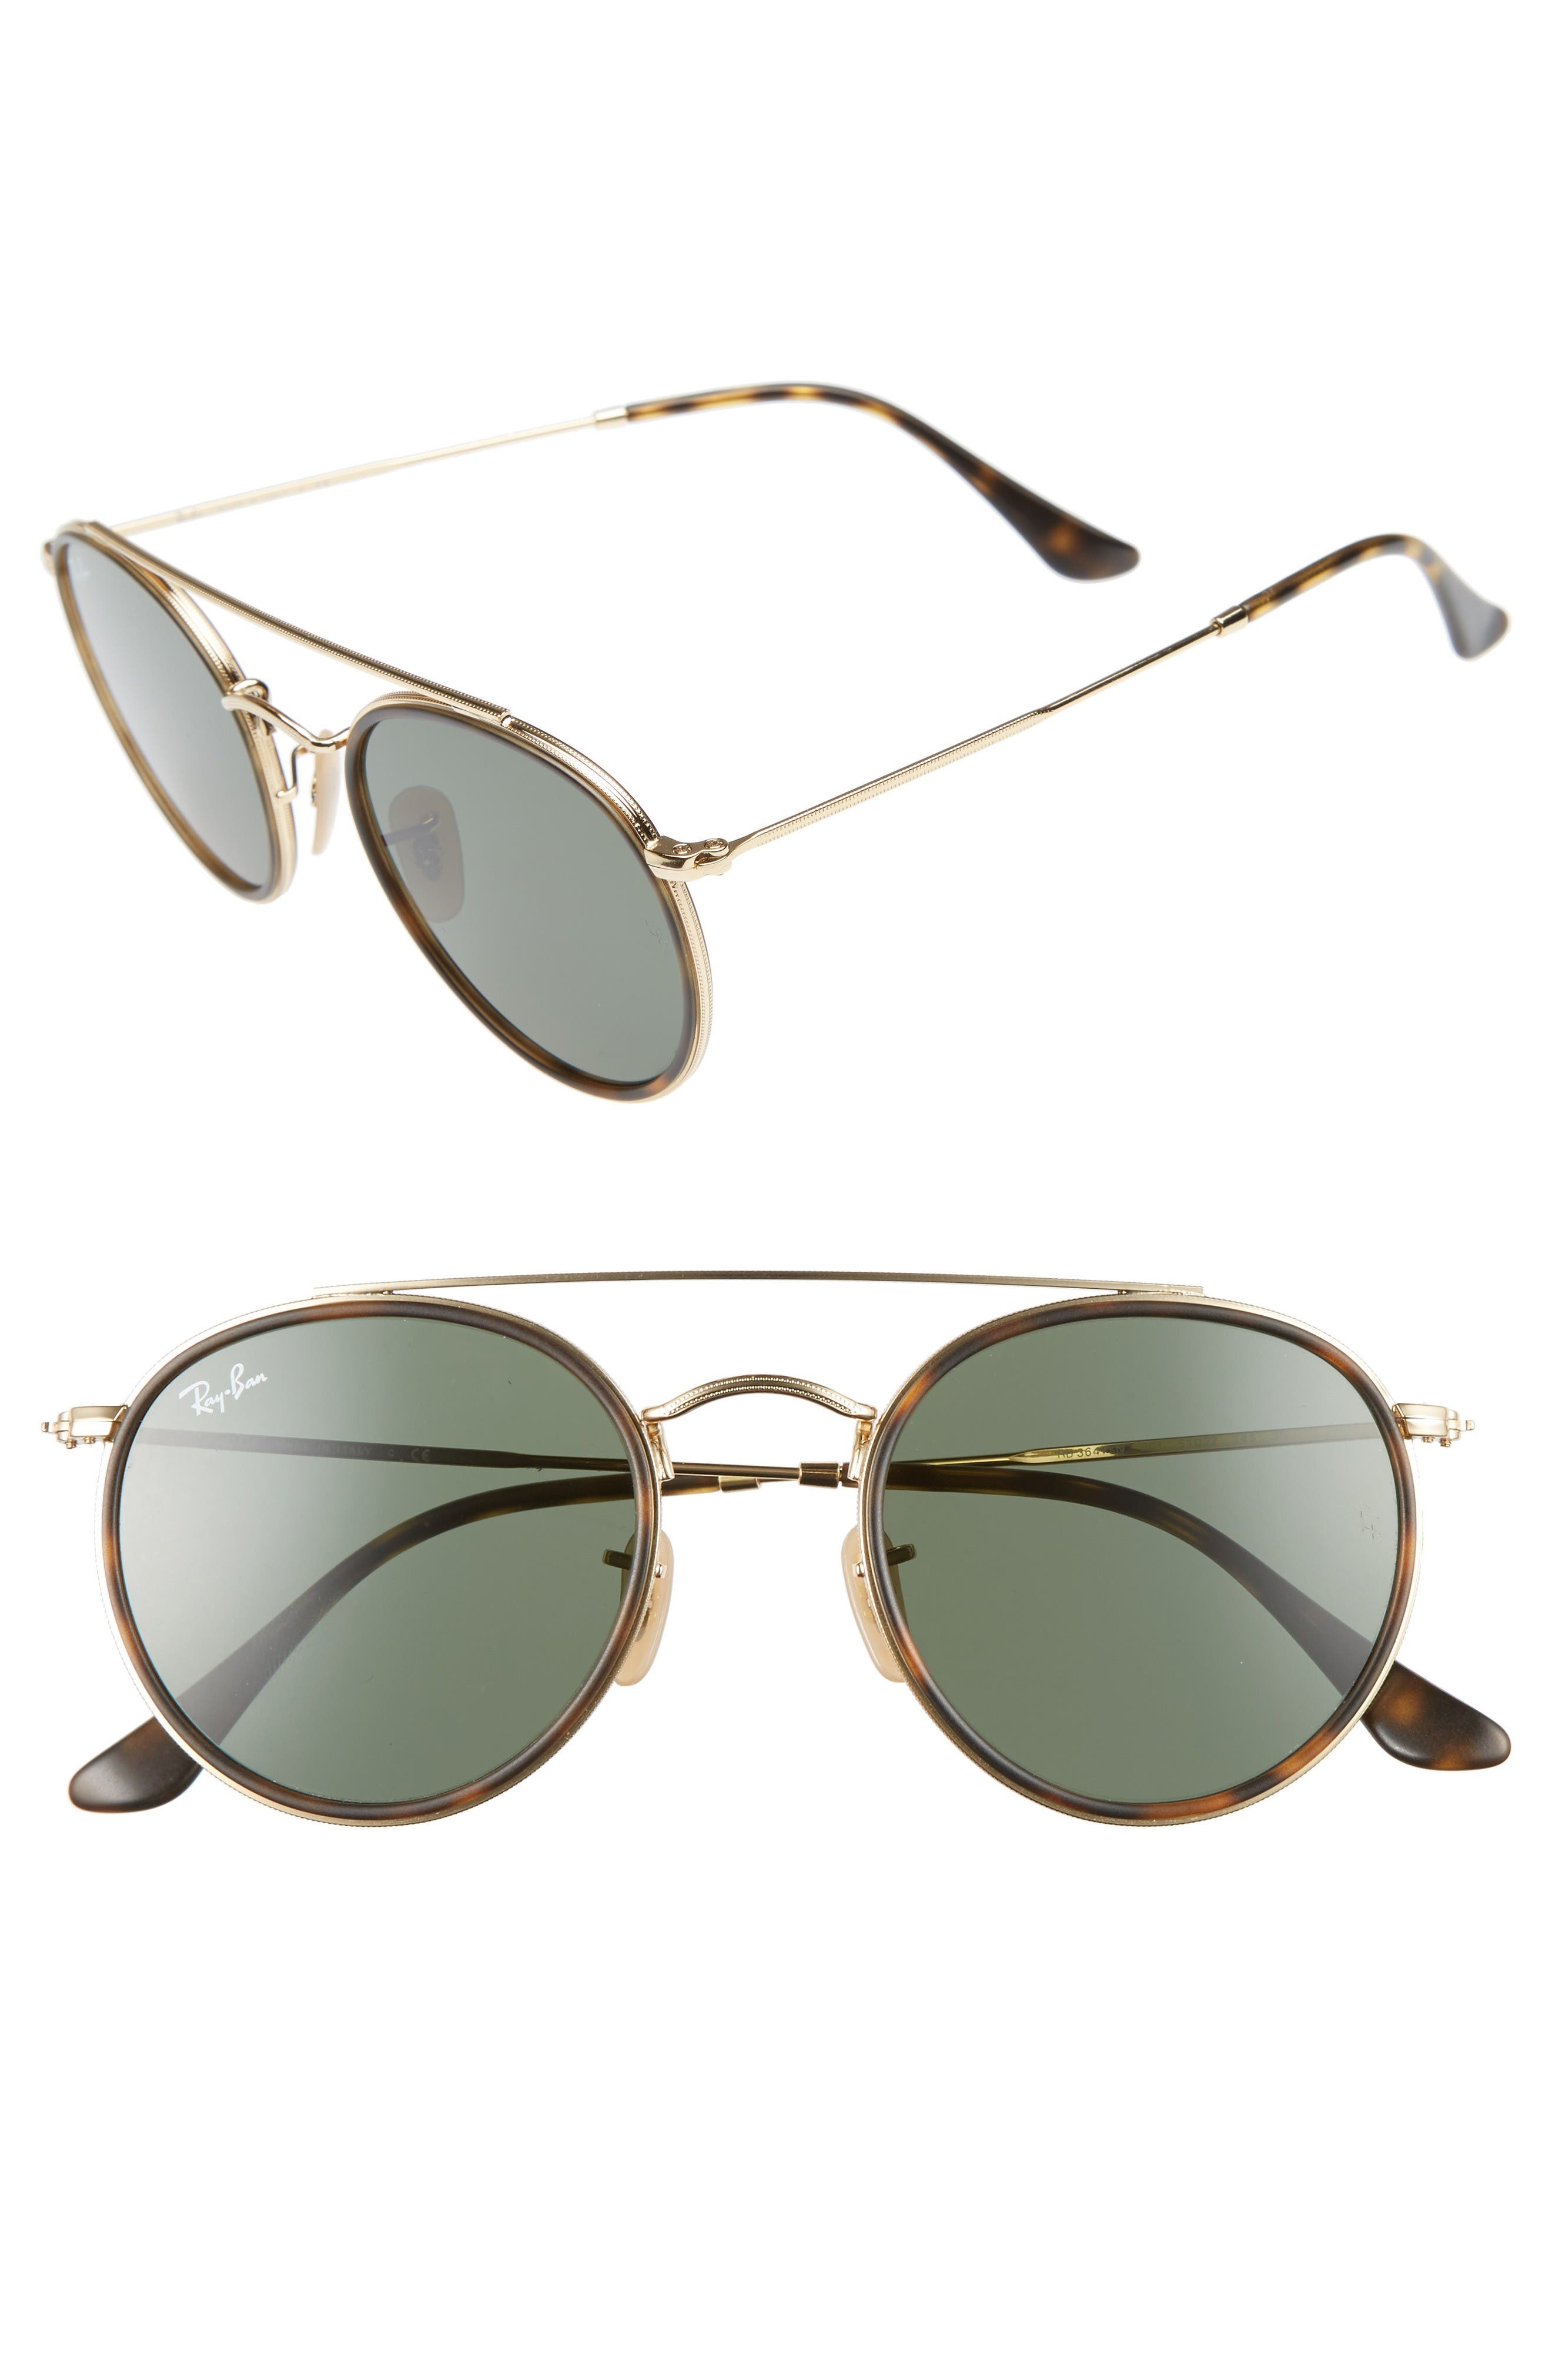 Main Image - Ray-Ban 51mm Aviator Sunglasses